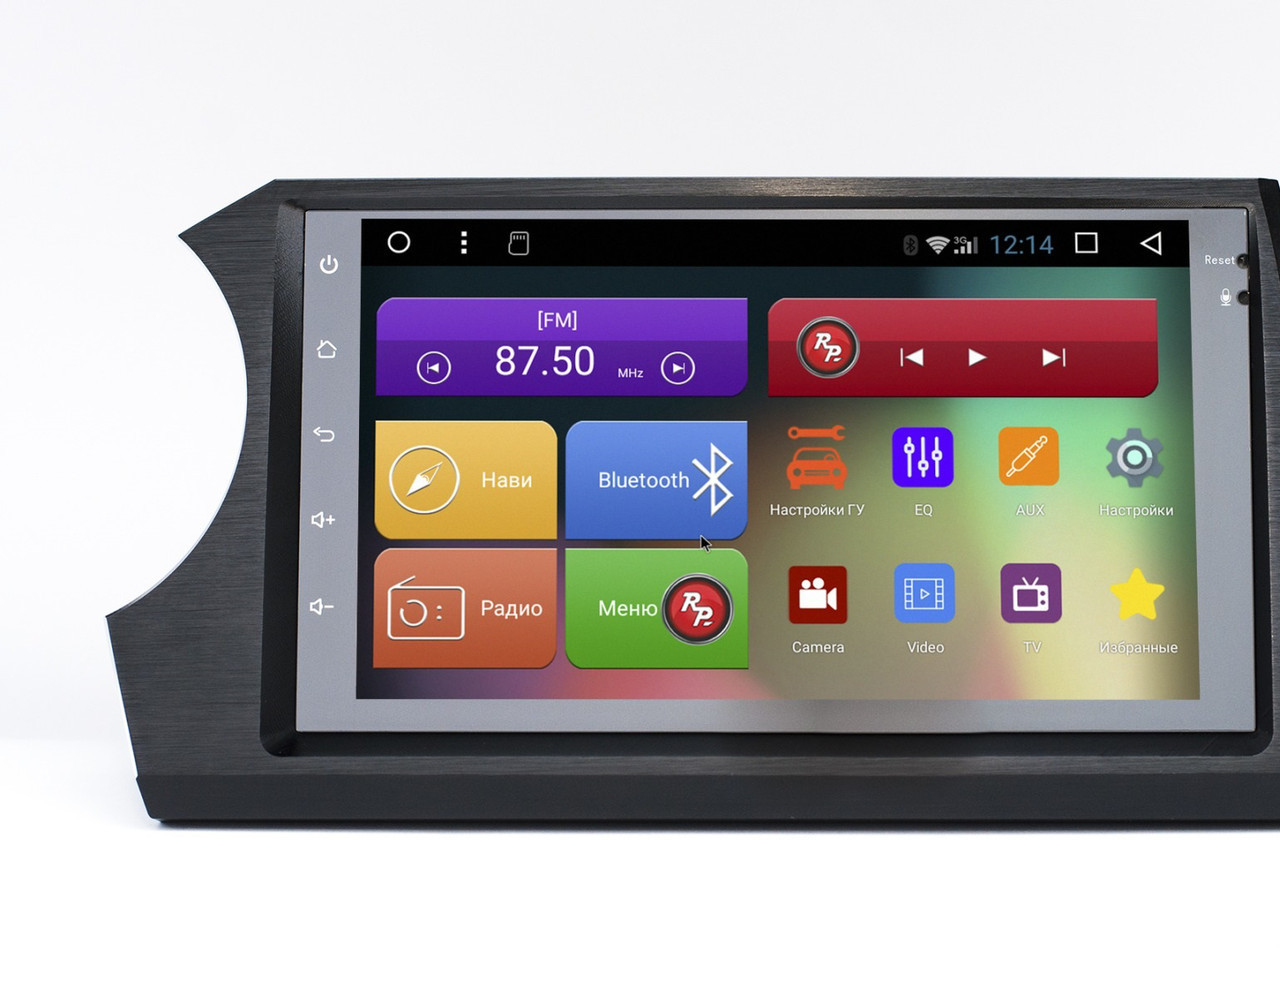 Штатное головное устройство для Ssang Yong Kyron (Korando) Android 7.1.1 (Nougat) RedPower 31158 IPS